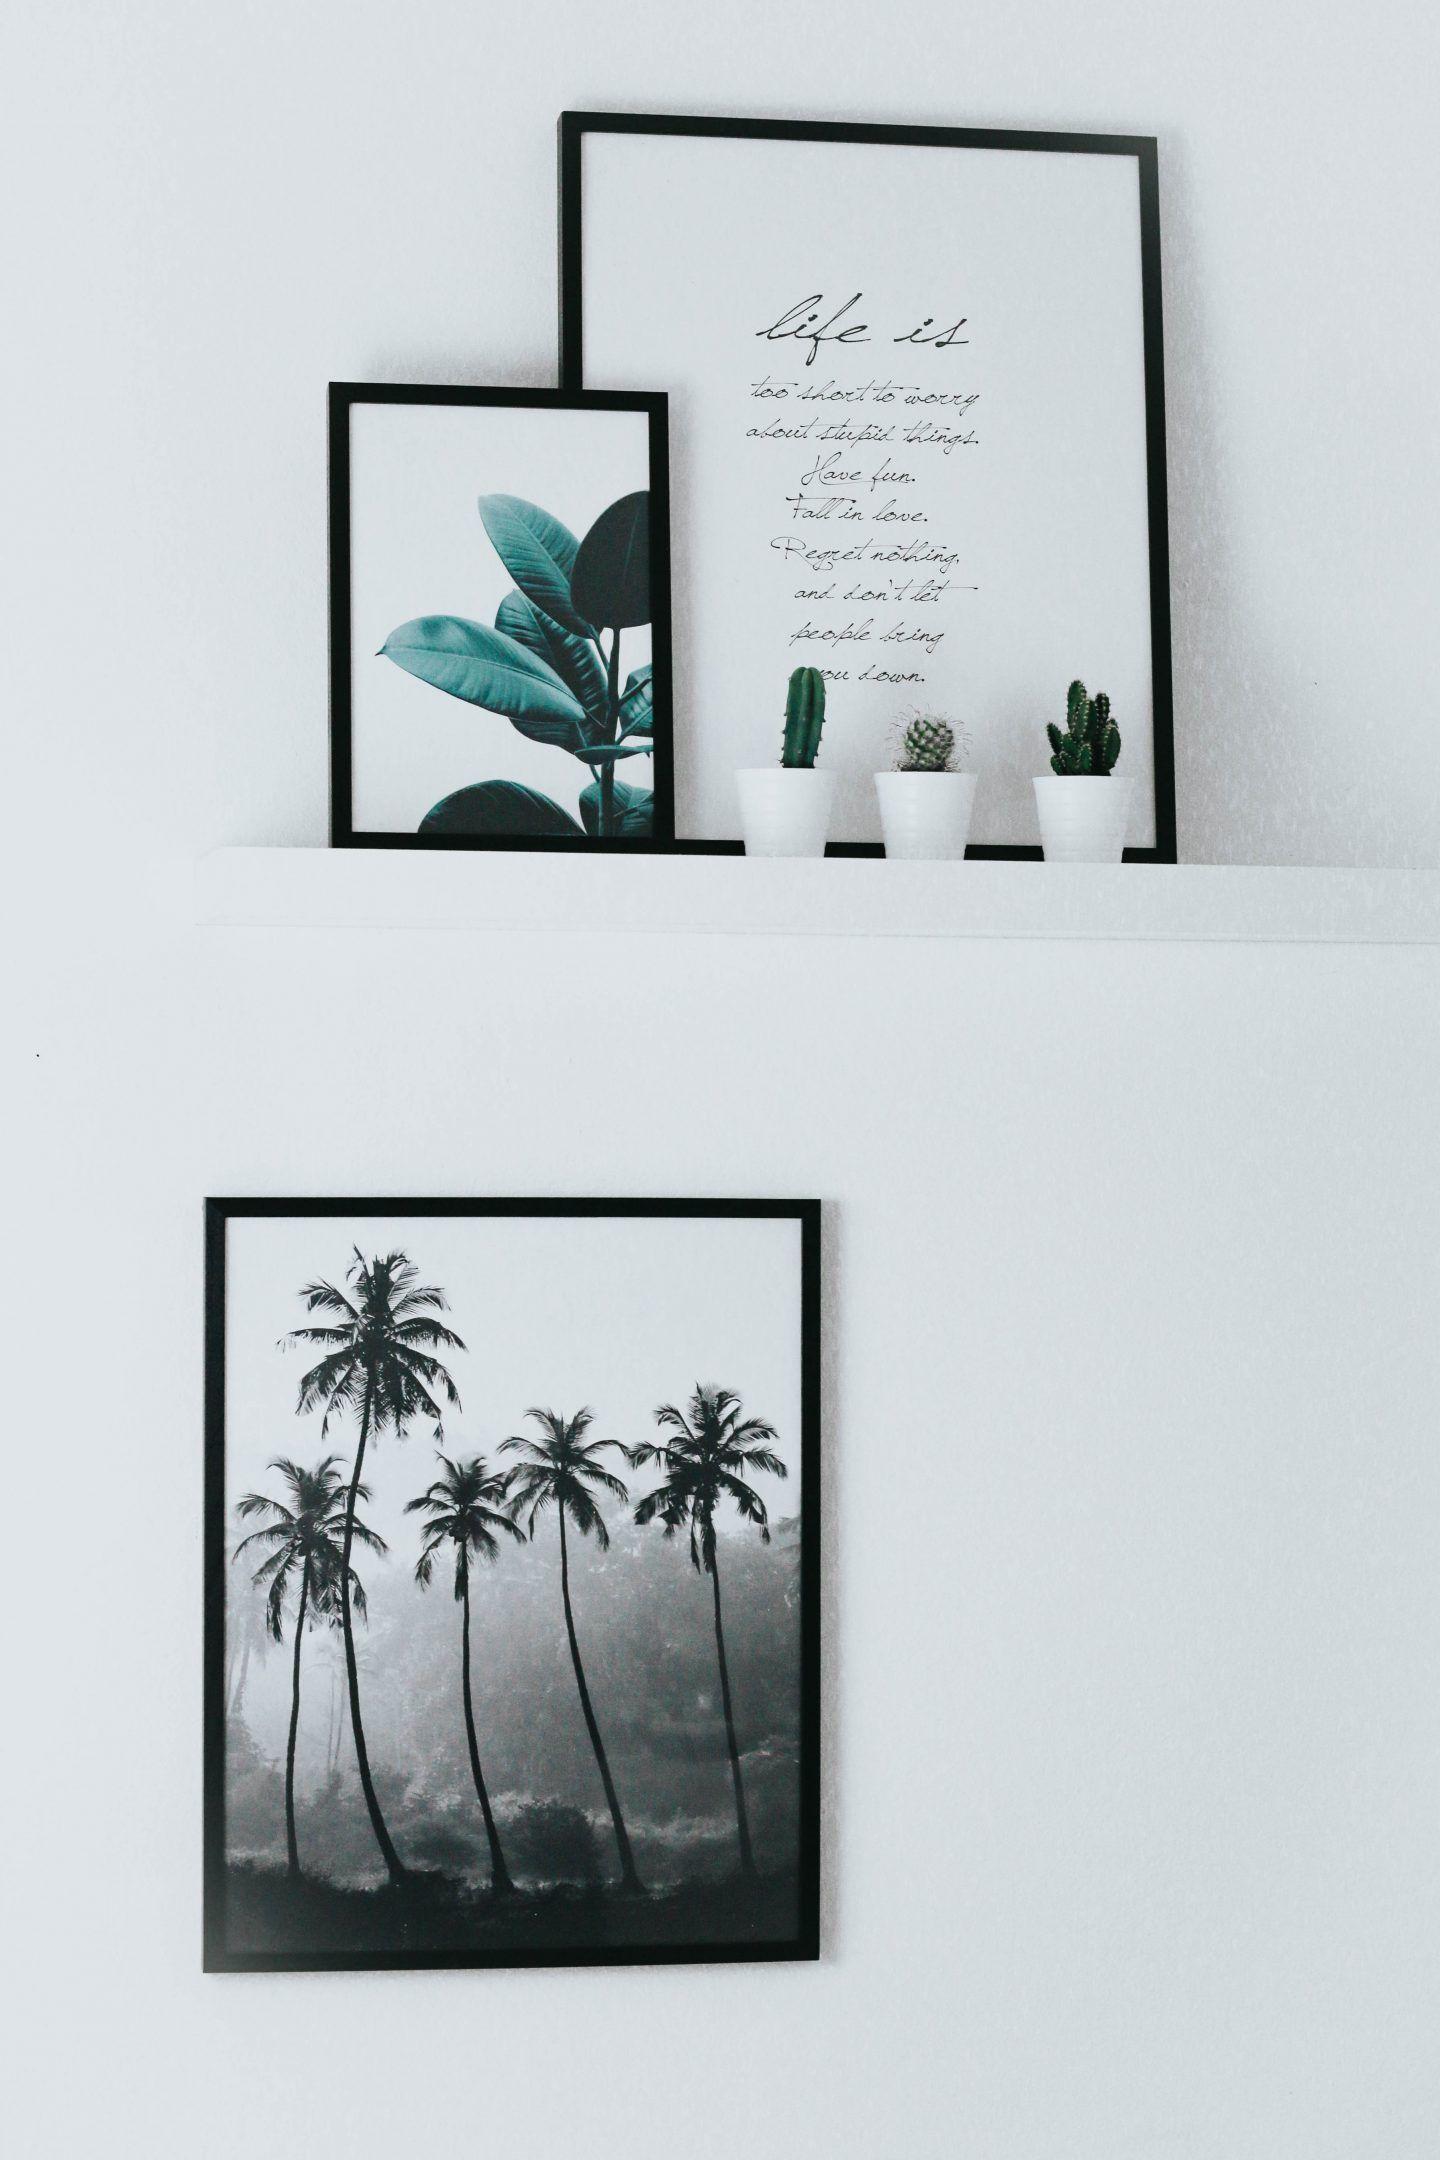 Scandinavian Design Poster Mit Desenio, Greenery, Cactus U003e  Http://piecesofmara.